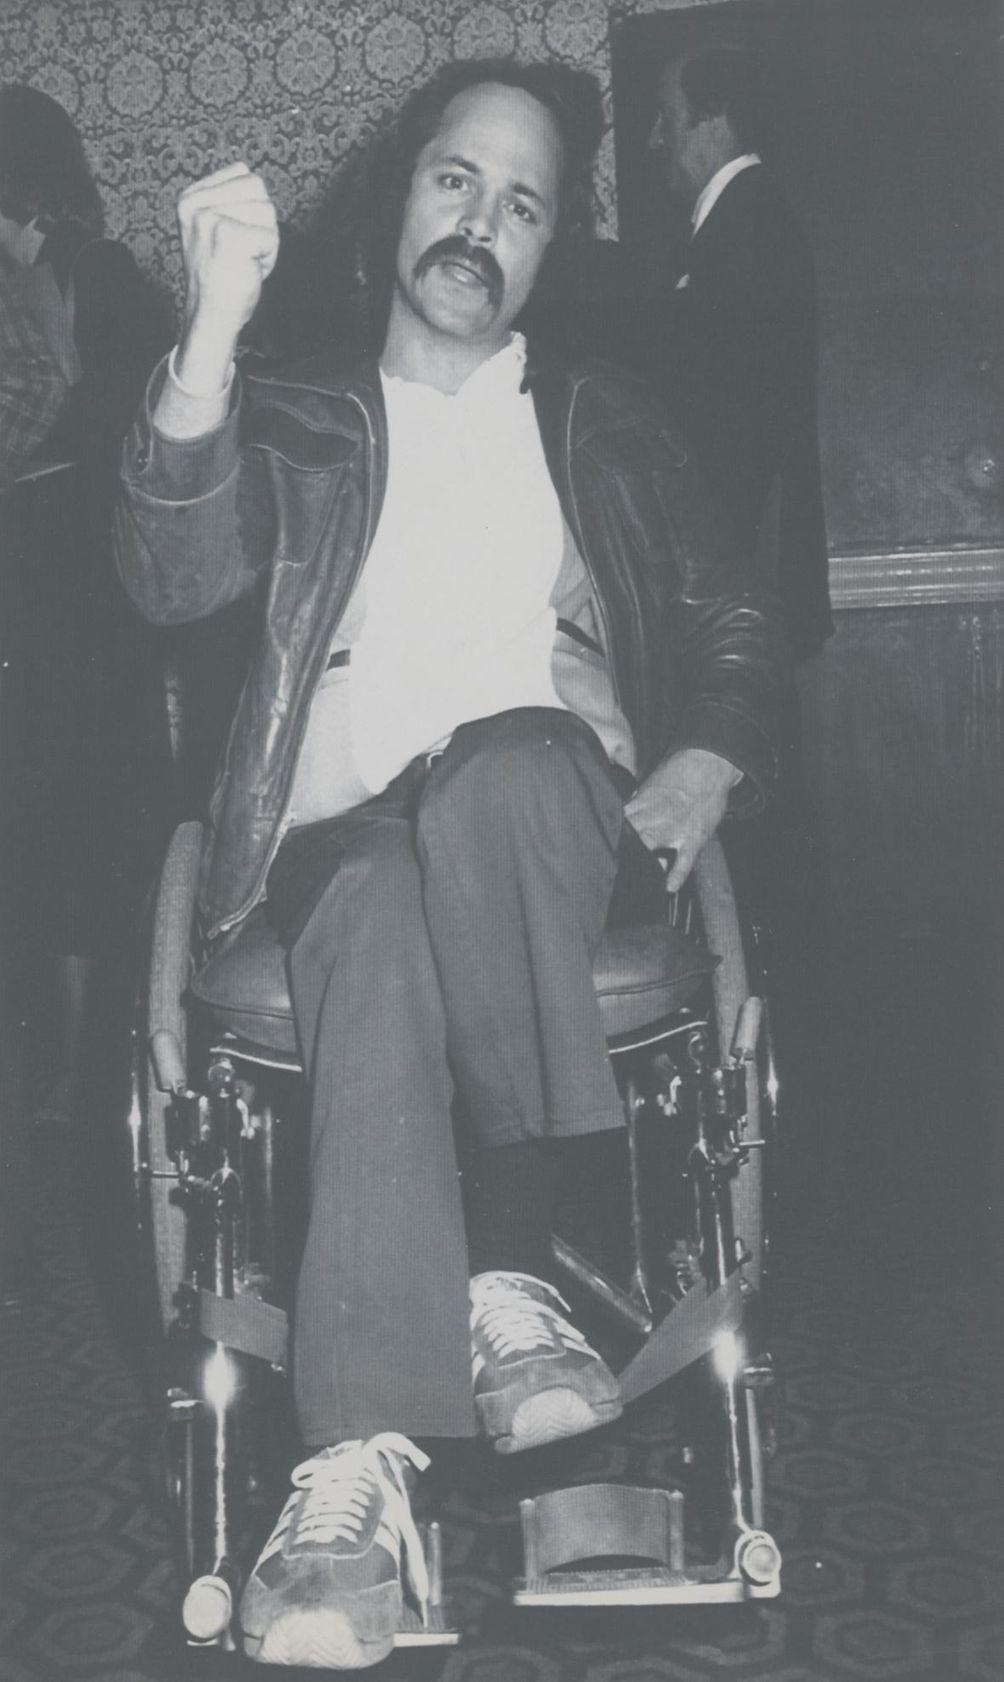 Vietnam veteran, anti-war activist and author Ron Kovic,